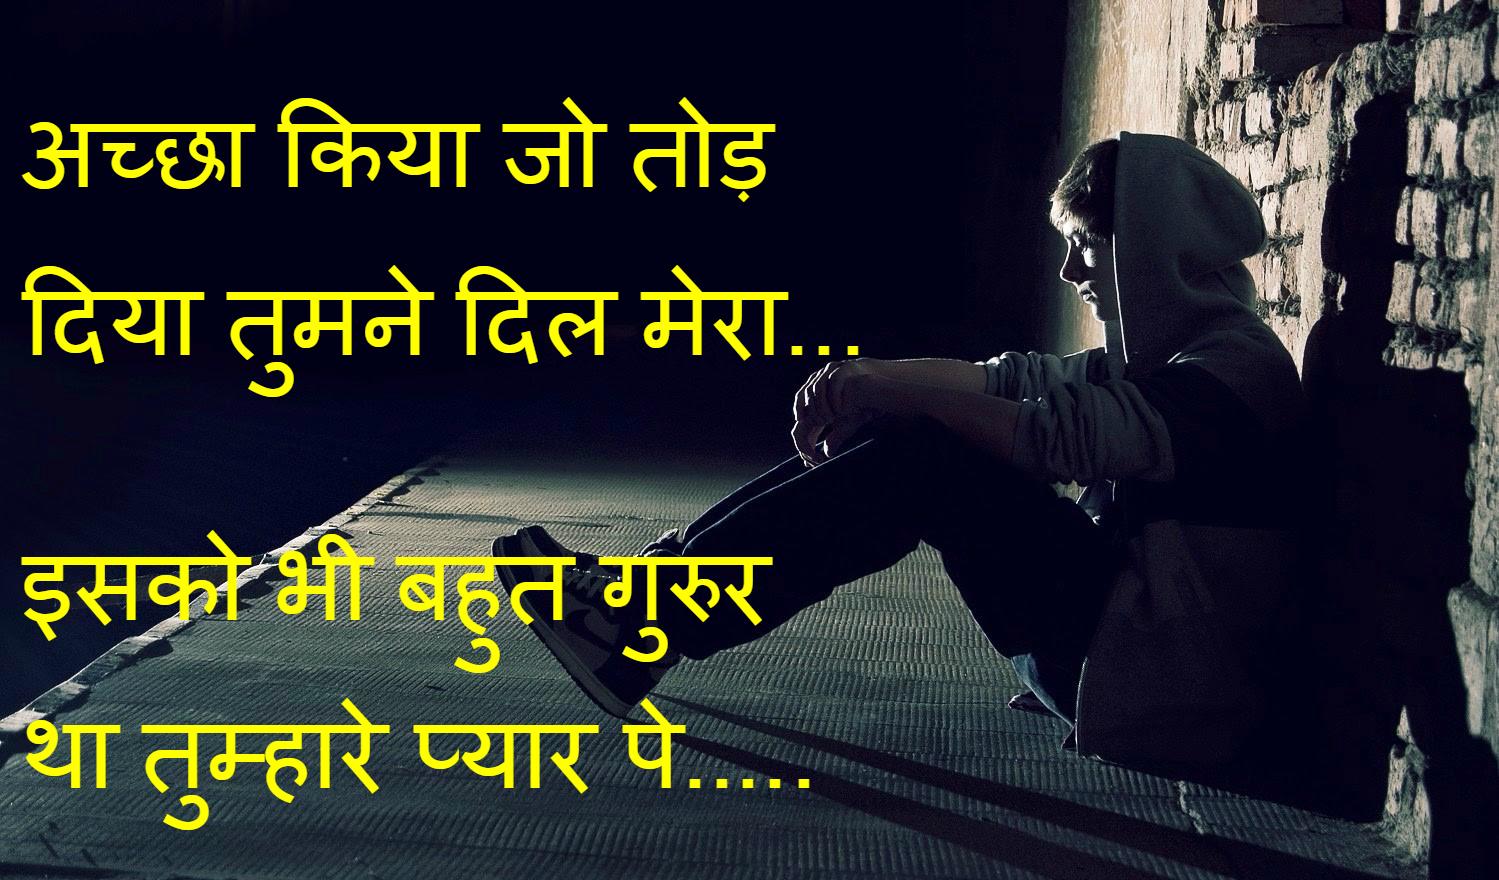 ... ,funny shayari,hindi wallpaper,friendship shayaI,shayari wallpaper